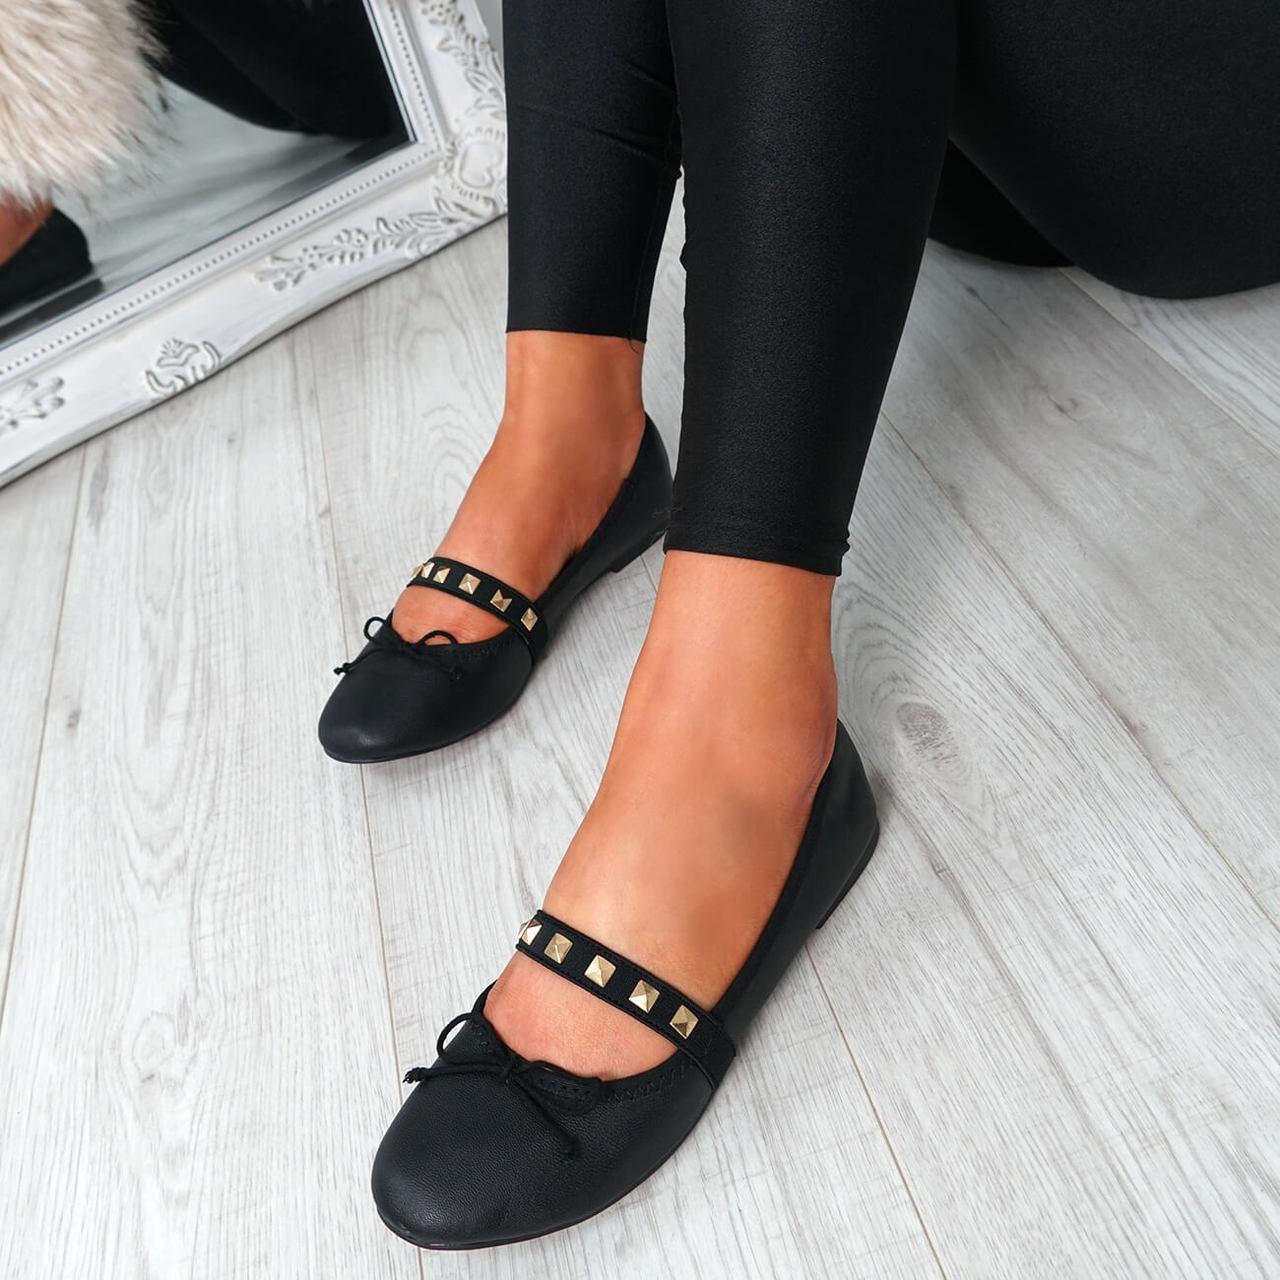 20049873adc0af Womens Ladies Slip On Ballerinas Rhinestone Bow Flat Pumps Shoes Size Uk